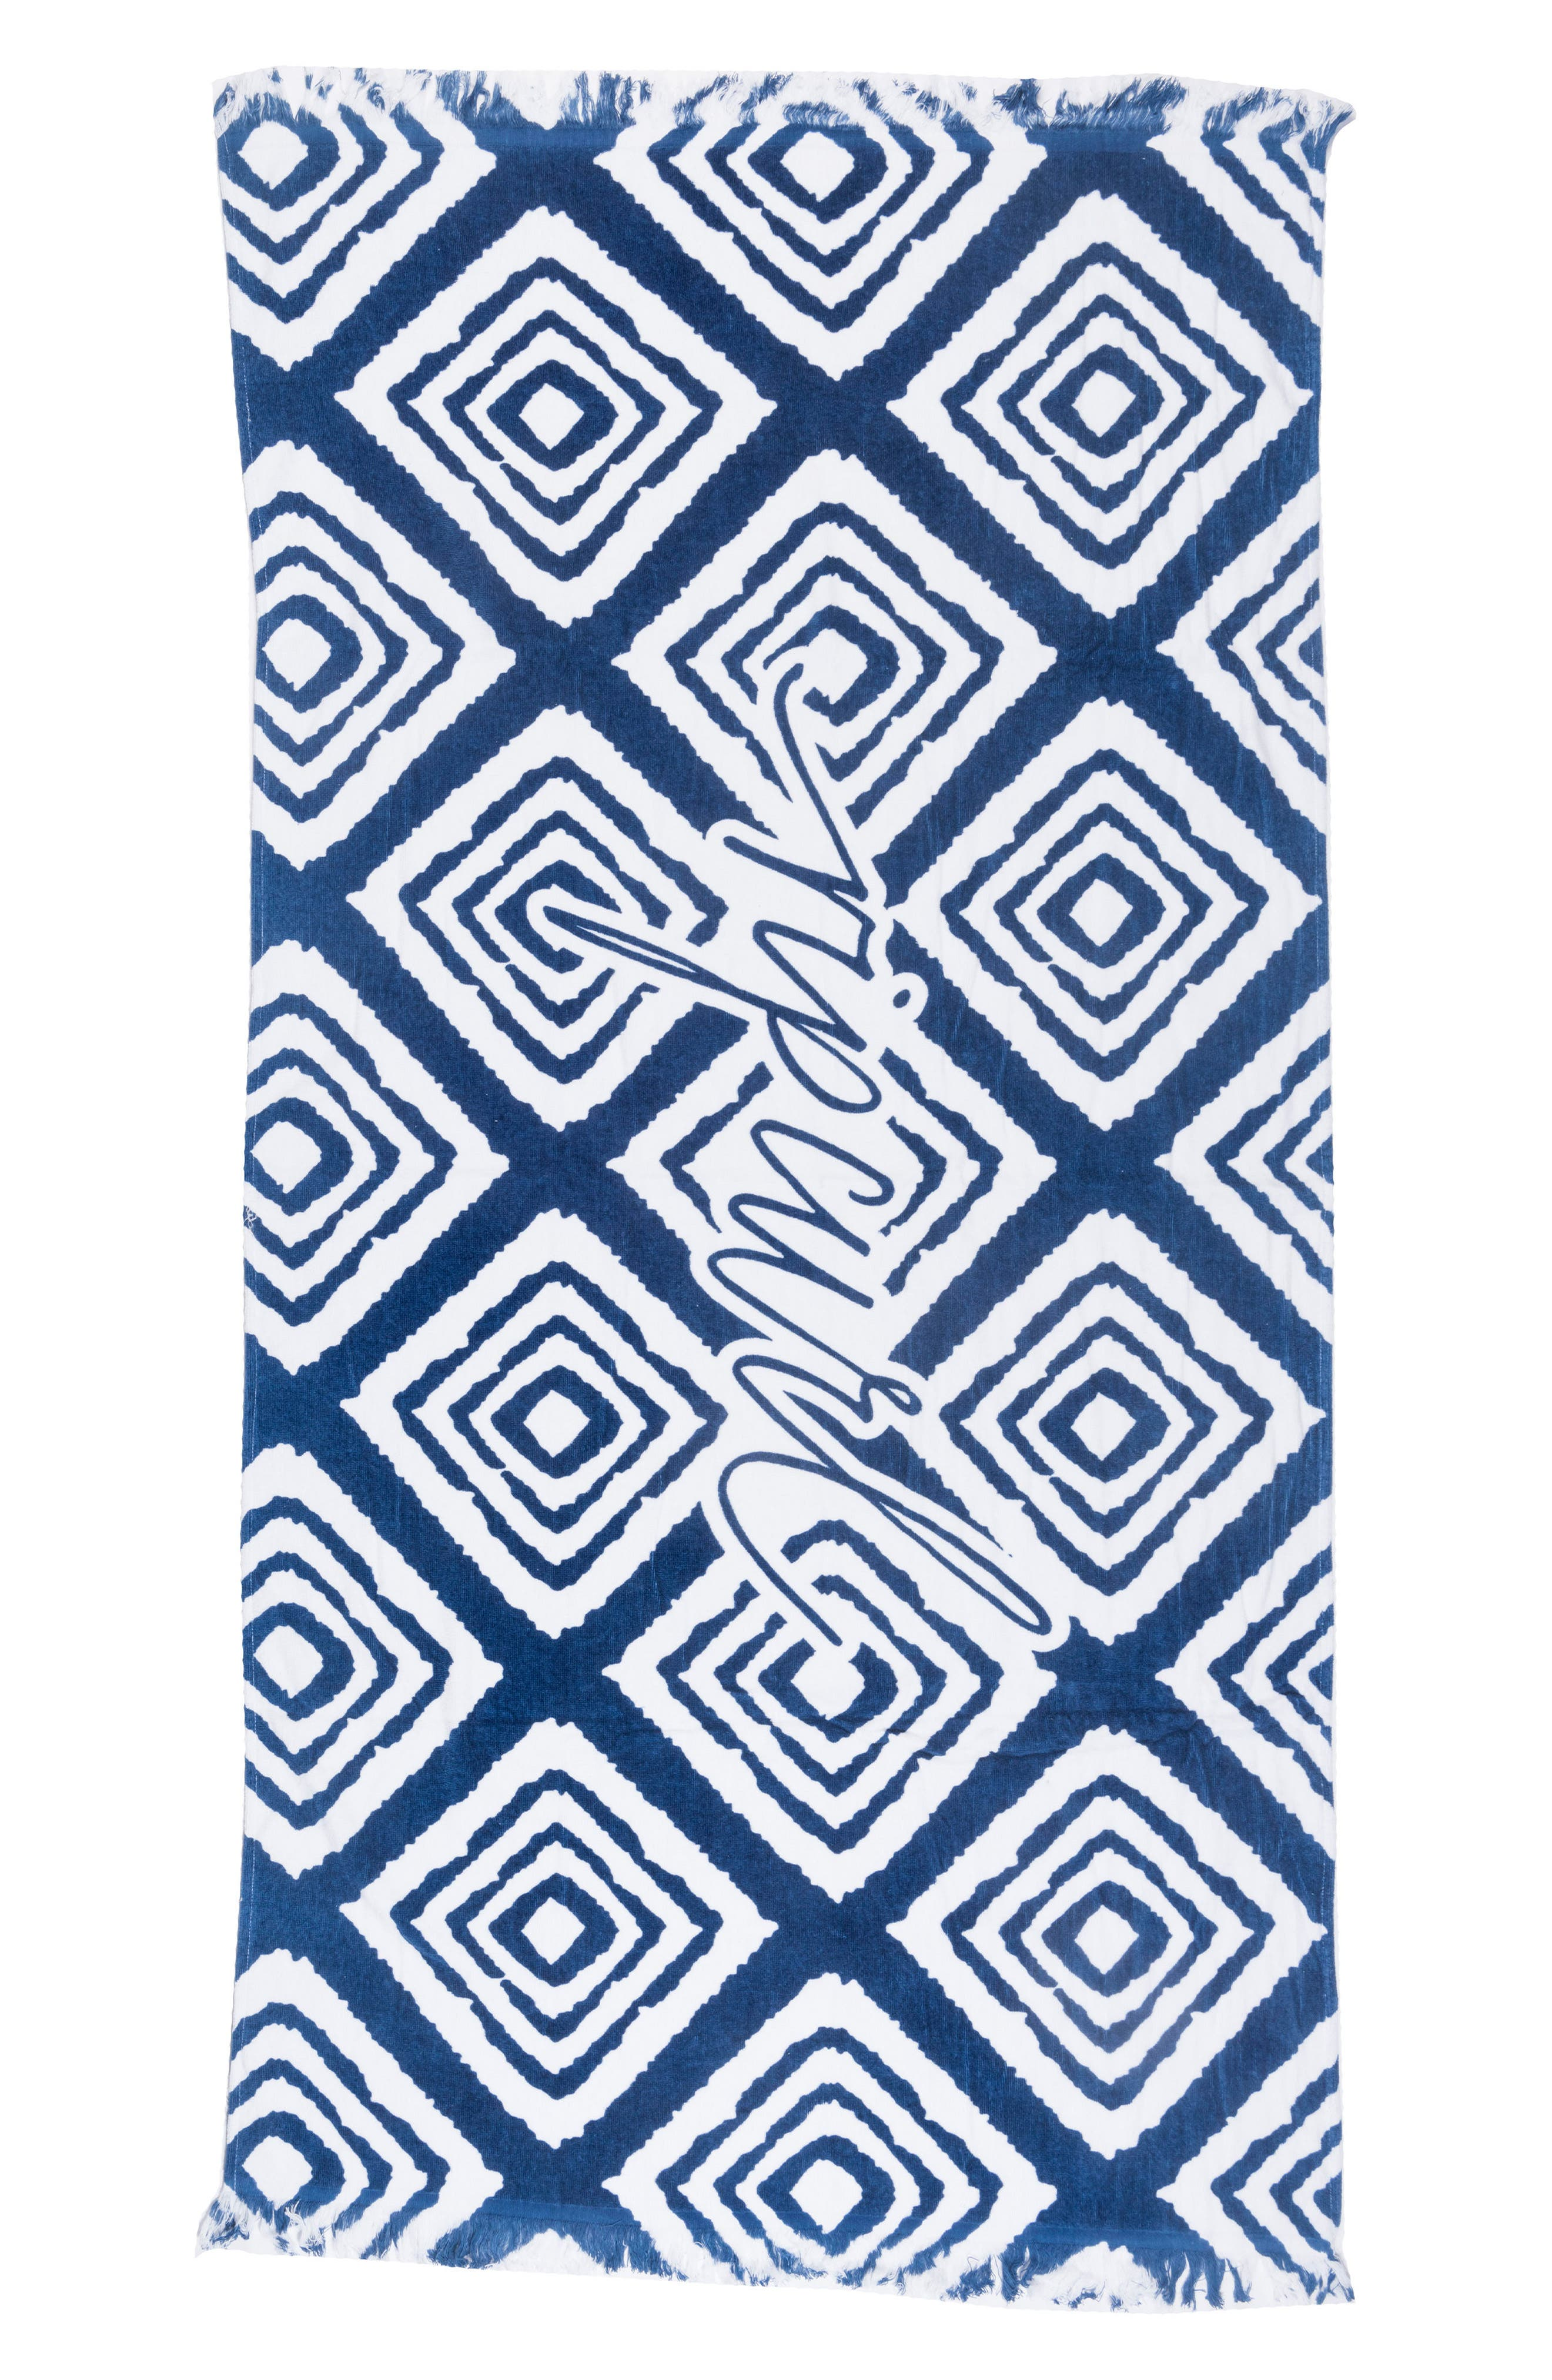 beach towel designs. Rip Curl Bazaar Beach Towel Designs